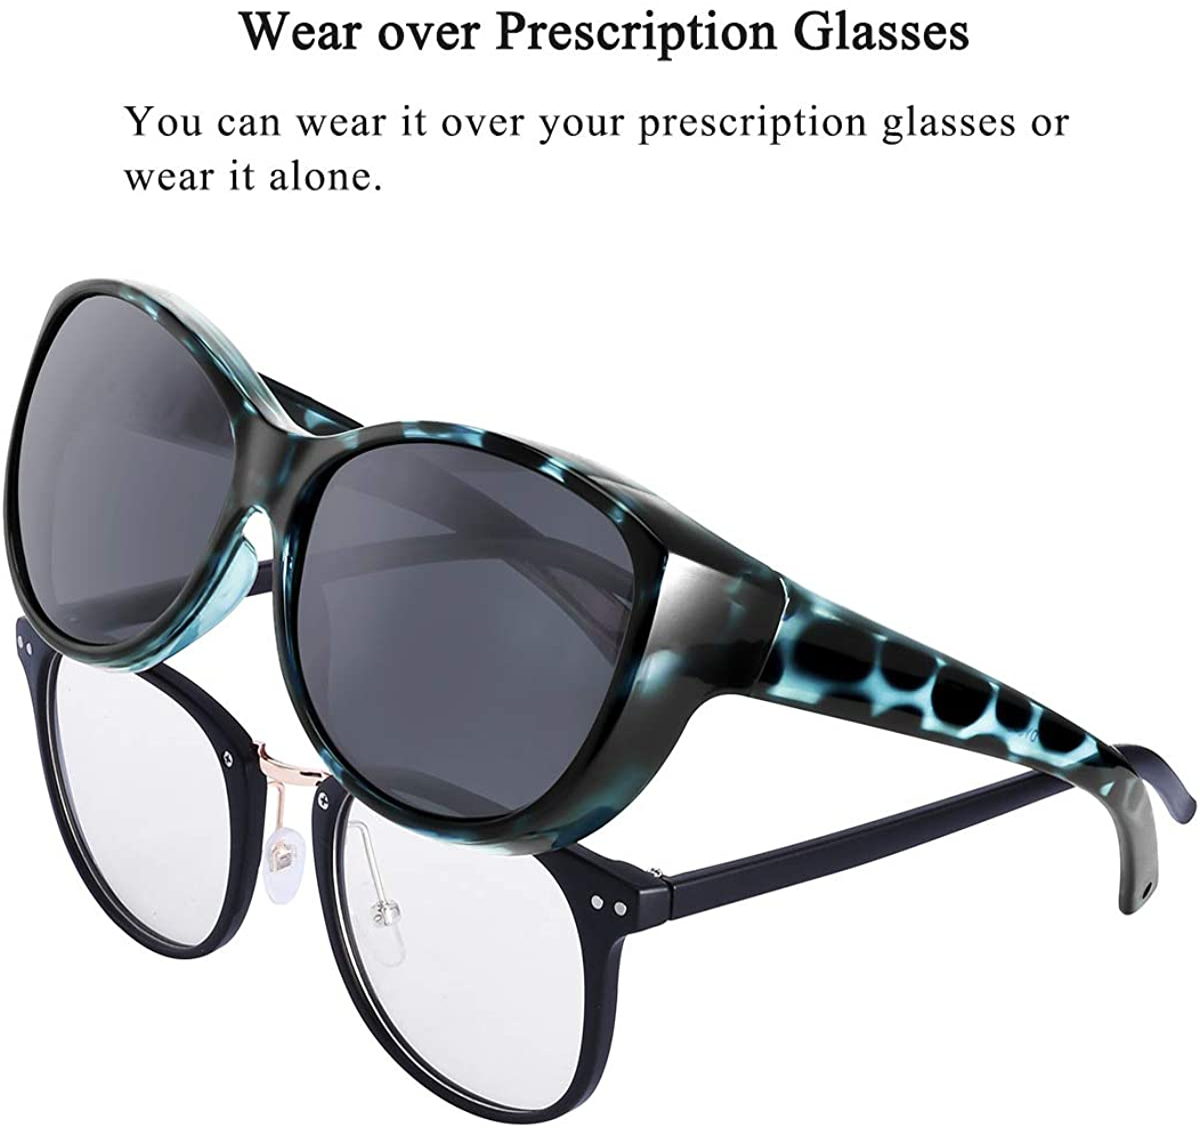 Br'Guras Polarized Oversized Sunglasses Wear over Prescription with Purple Frame for Women&Men